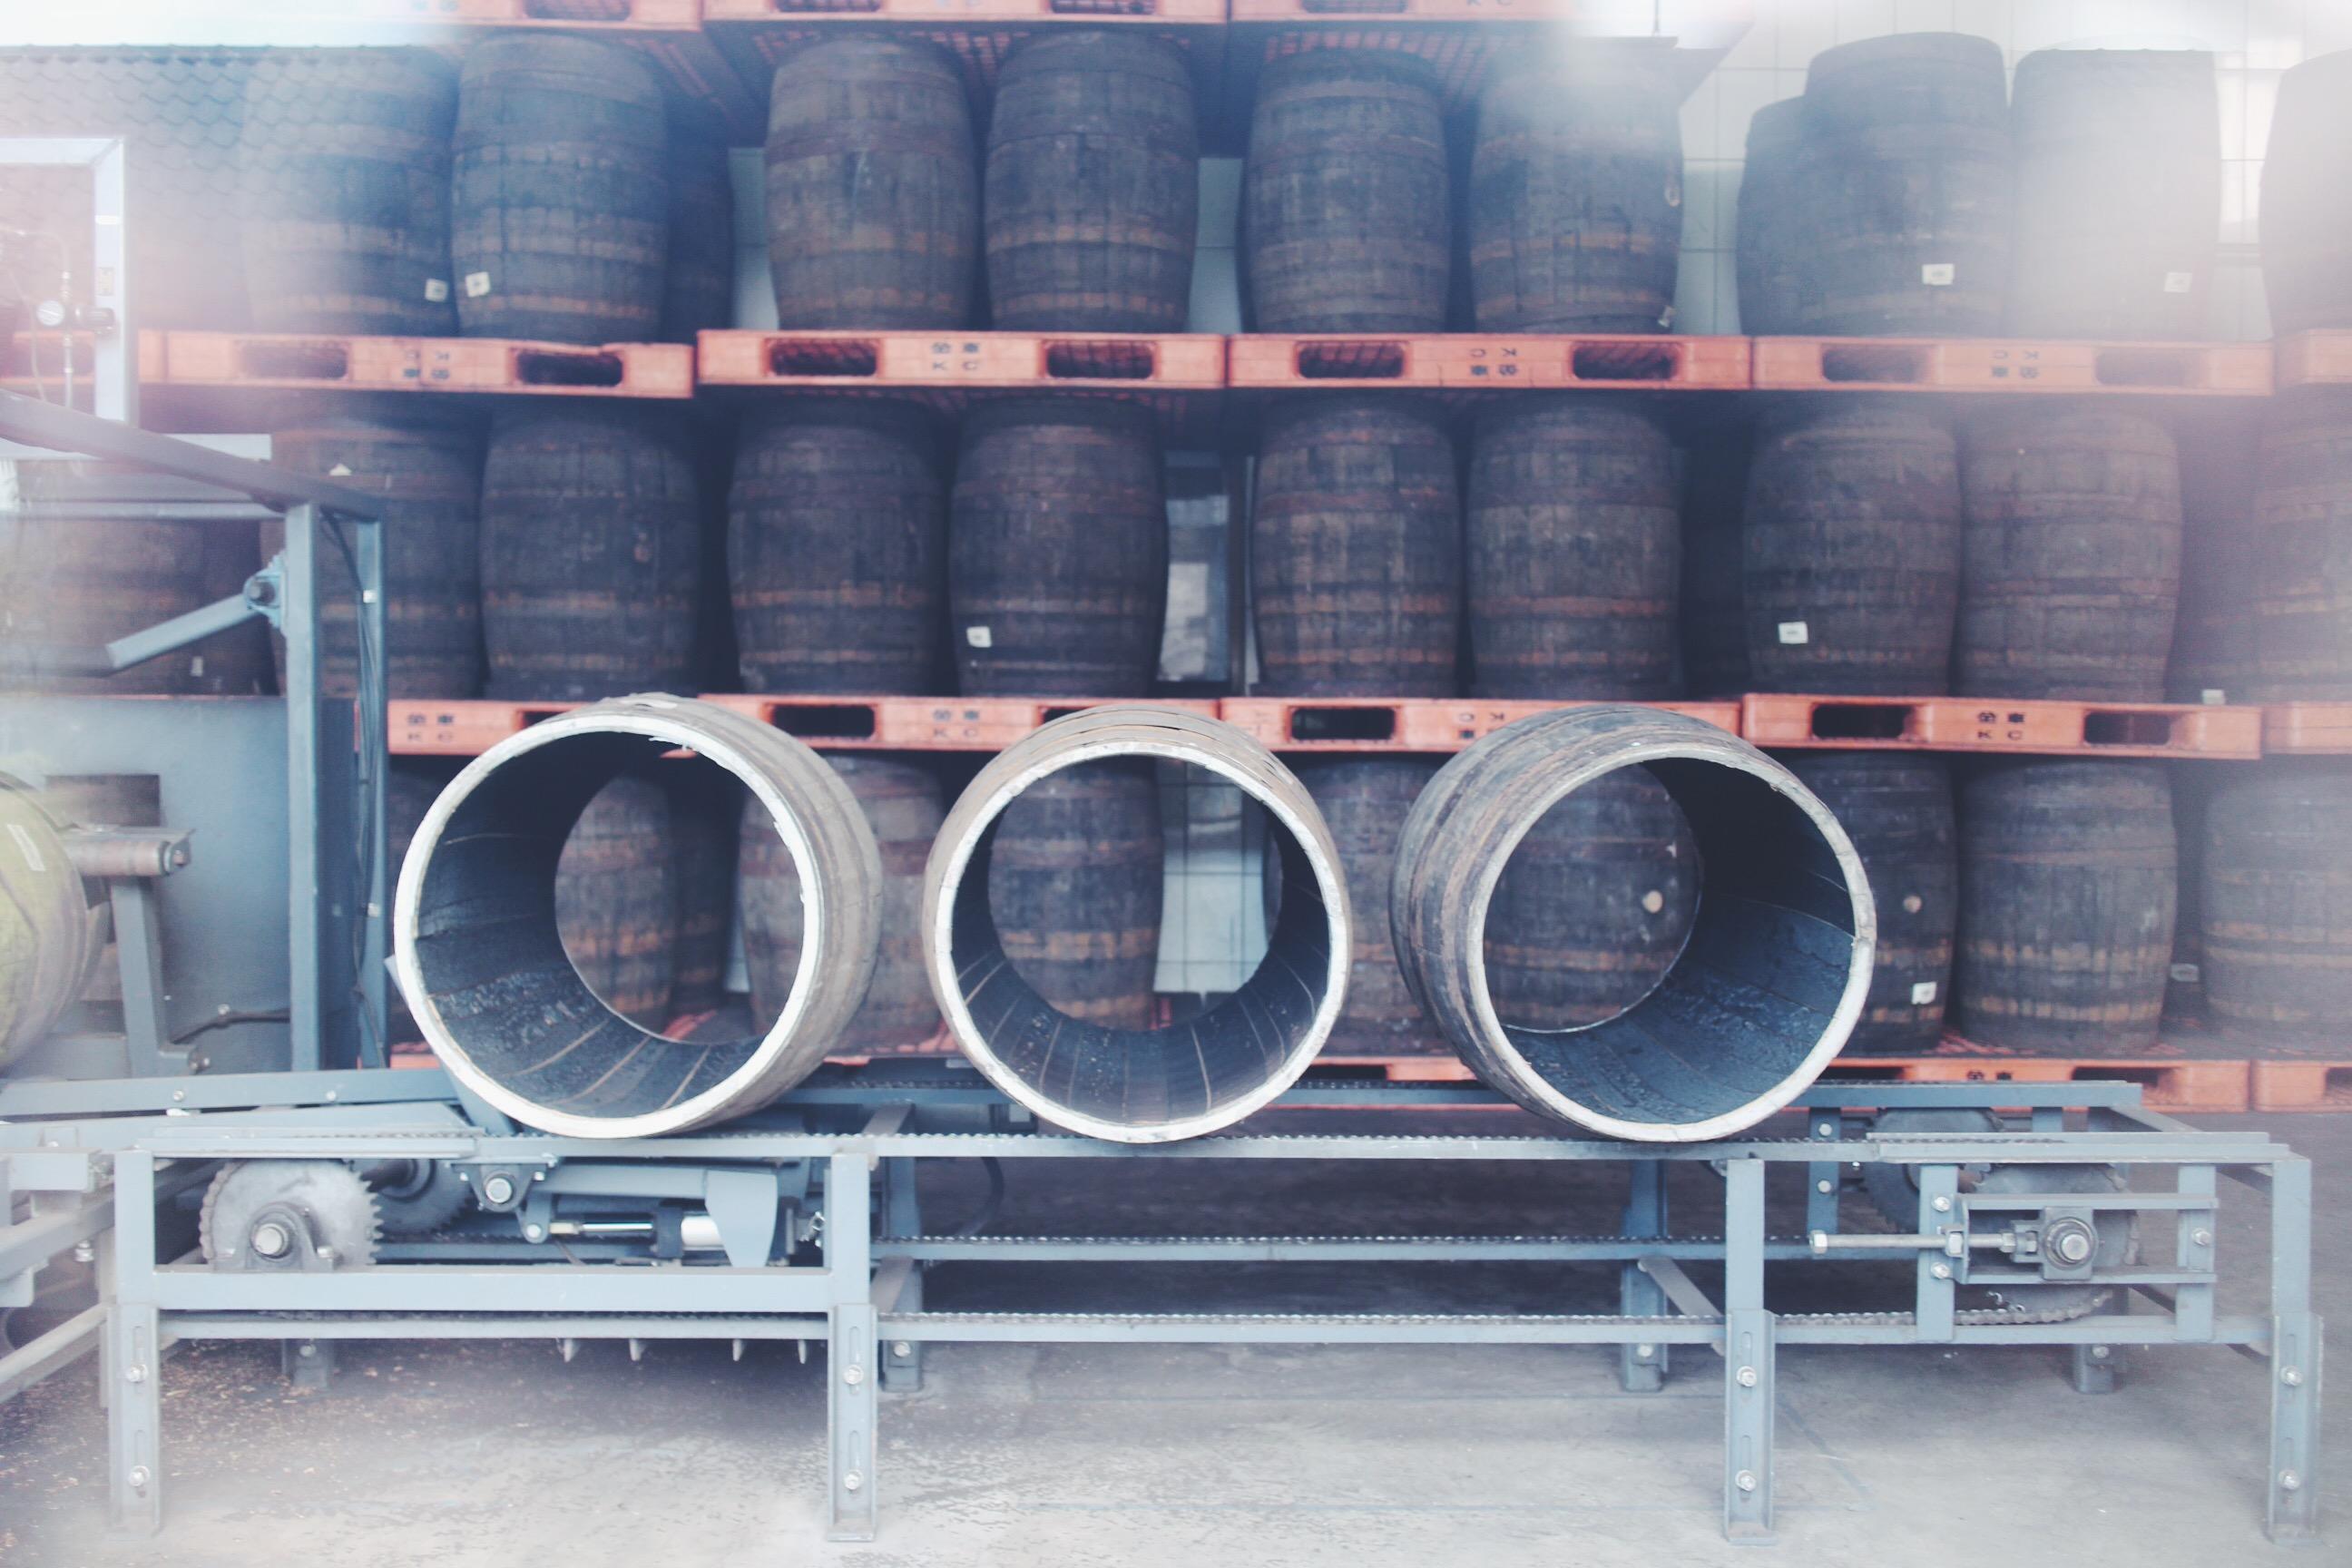 Sherry cask, Kavalan Whisky, Taipei, Yilan, Taiwan